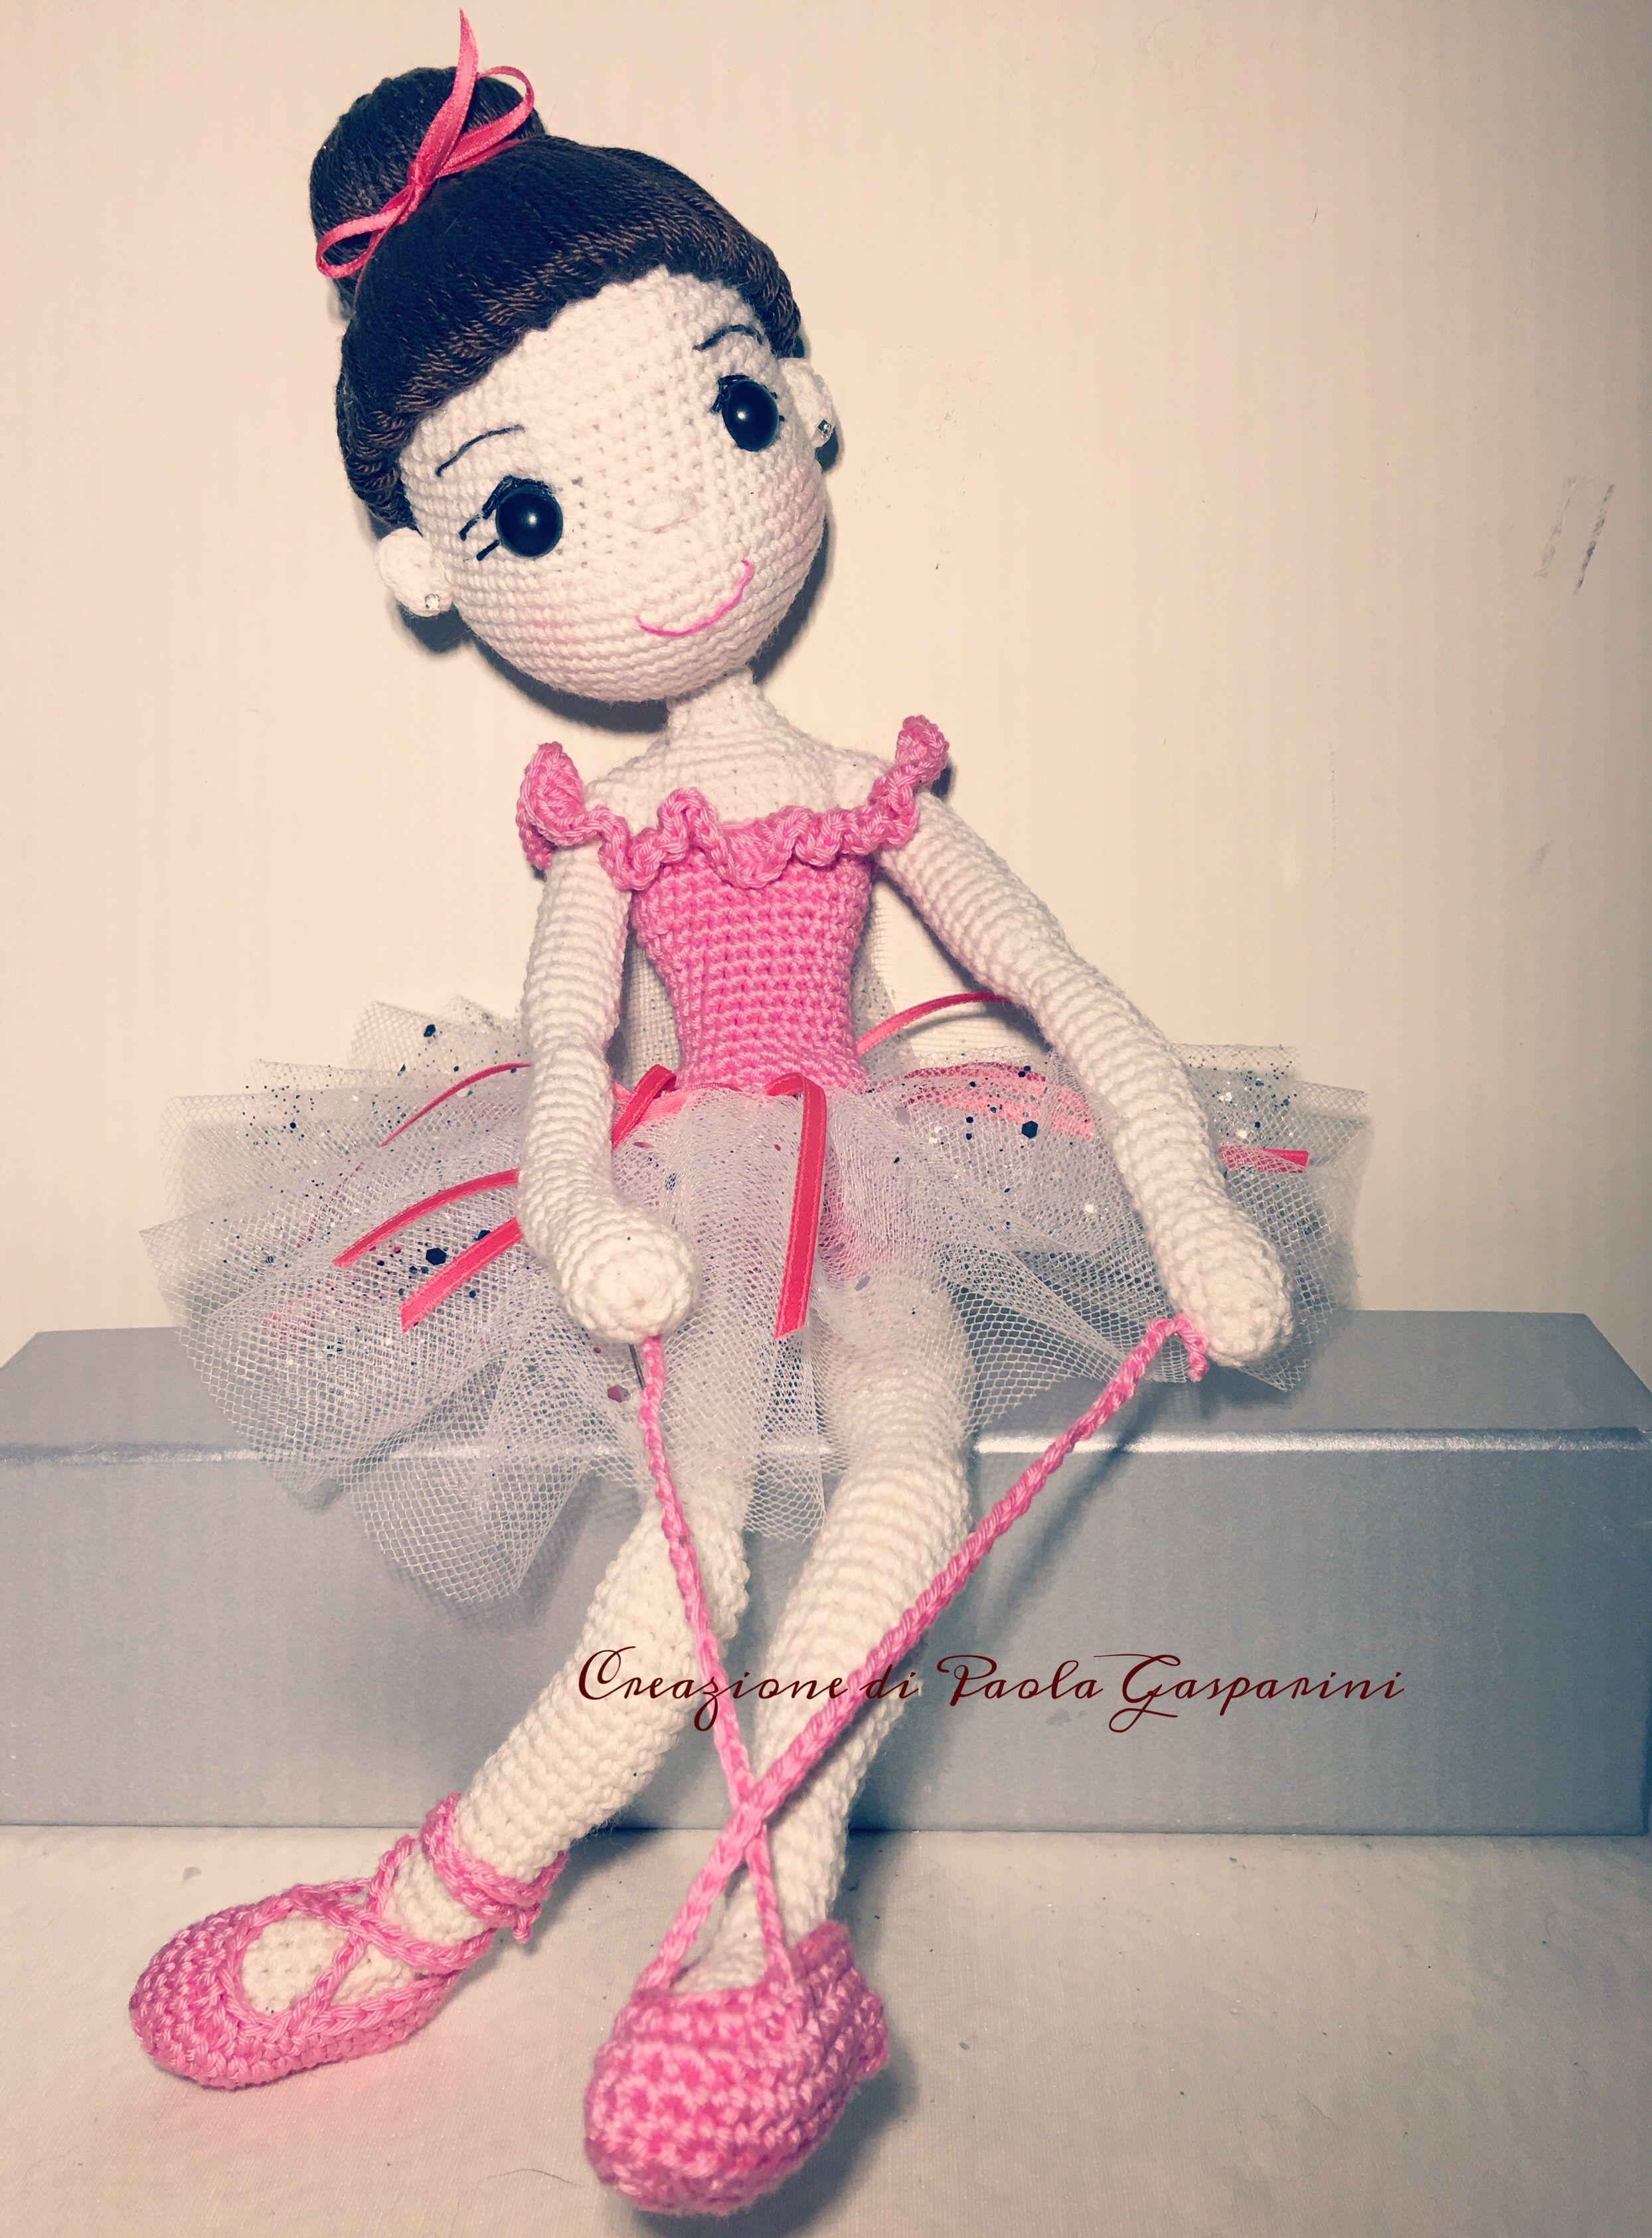 Anna Doll Dancer Ballerina Anna amigurumi Rif.:http://tinyminidesign.blogspot.it/2016/09/amigurumi-balerin-bebek-yapls-amigurumi.html?m=1